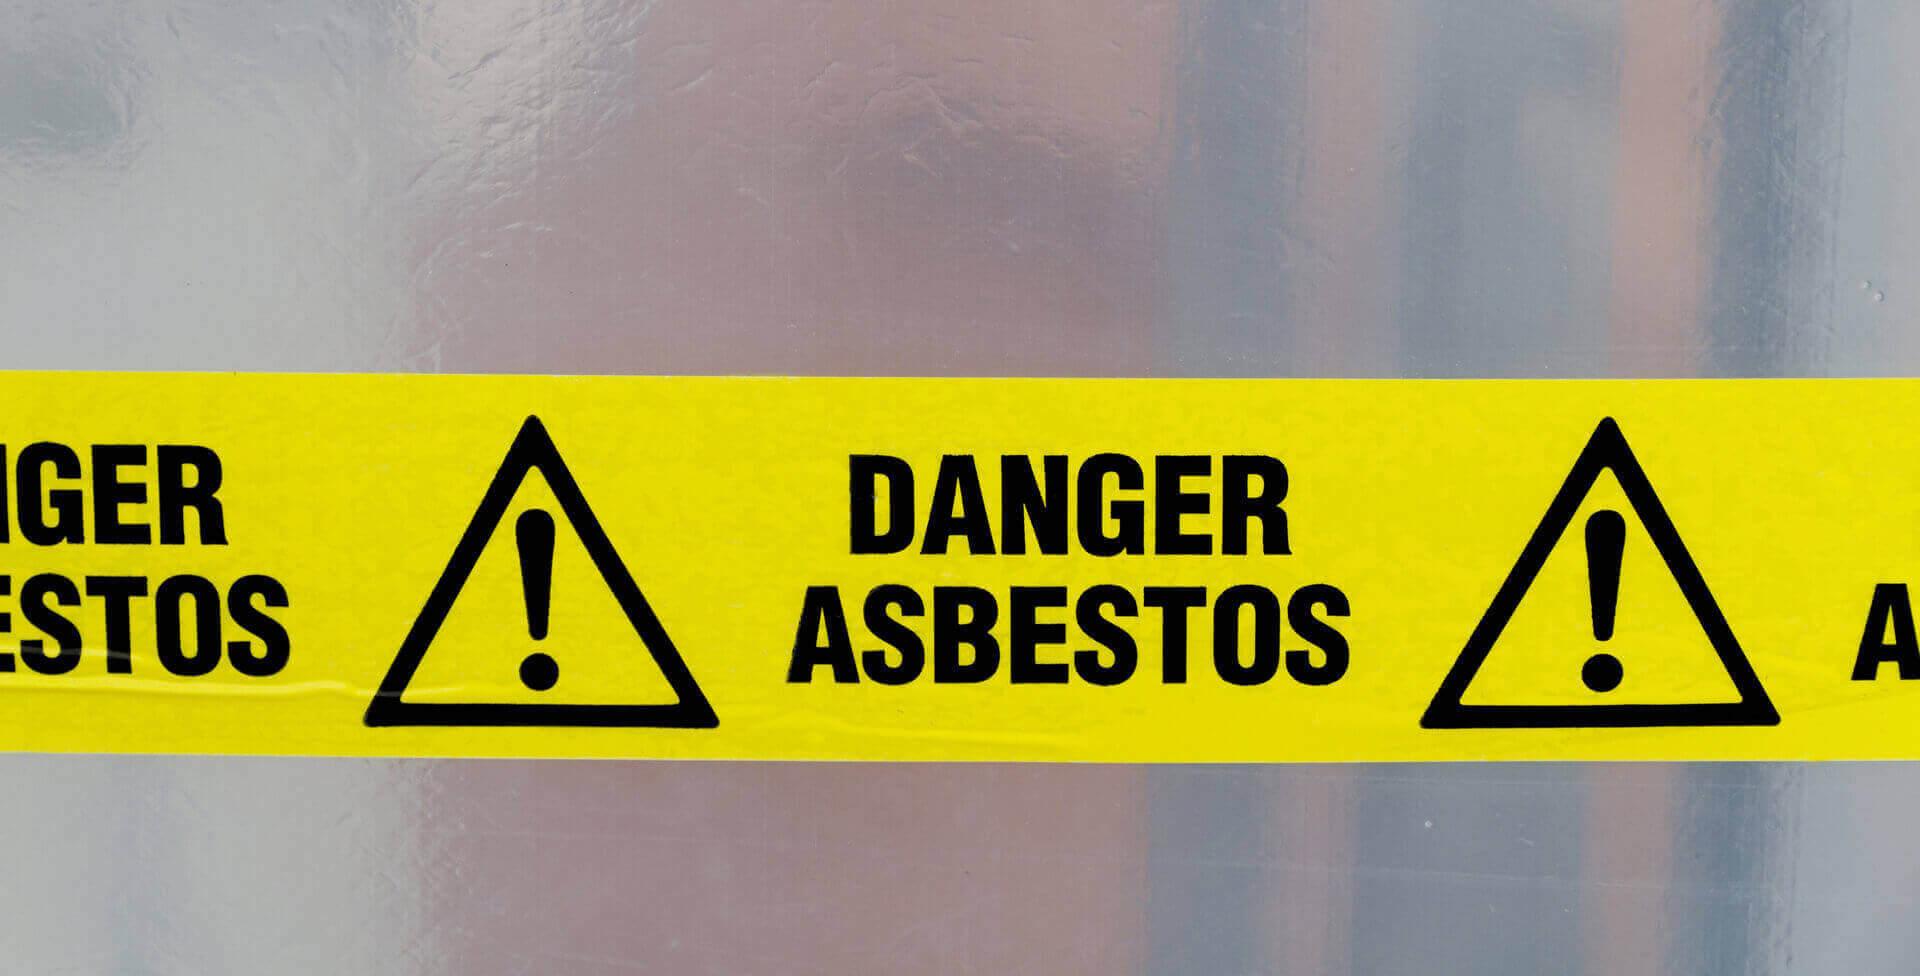 Asbestos Testing Auckland | Asbestos Testing Christchurch | Asbestos Management | Asbestos Management Plan